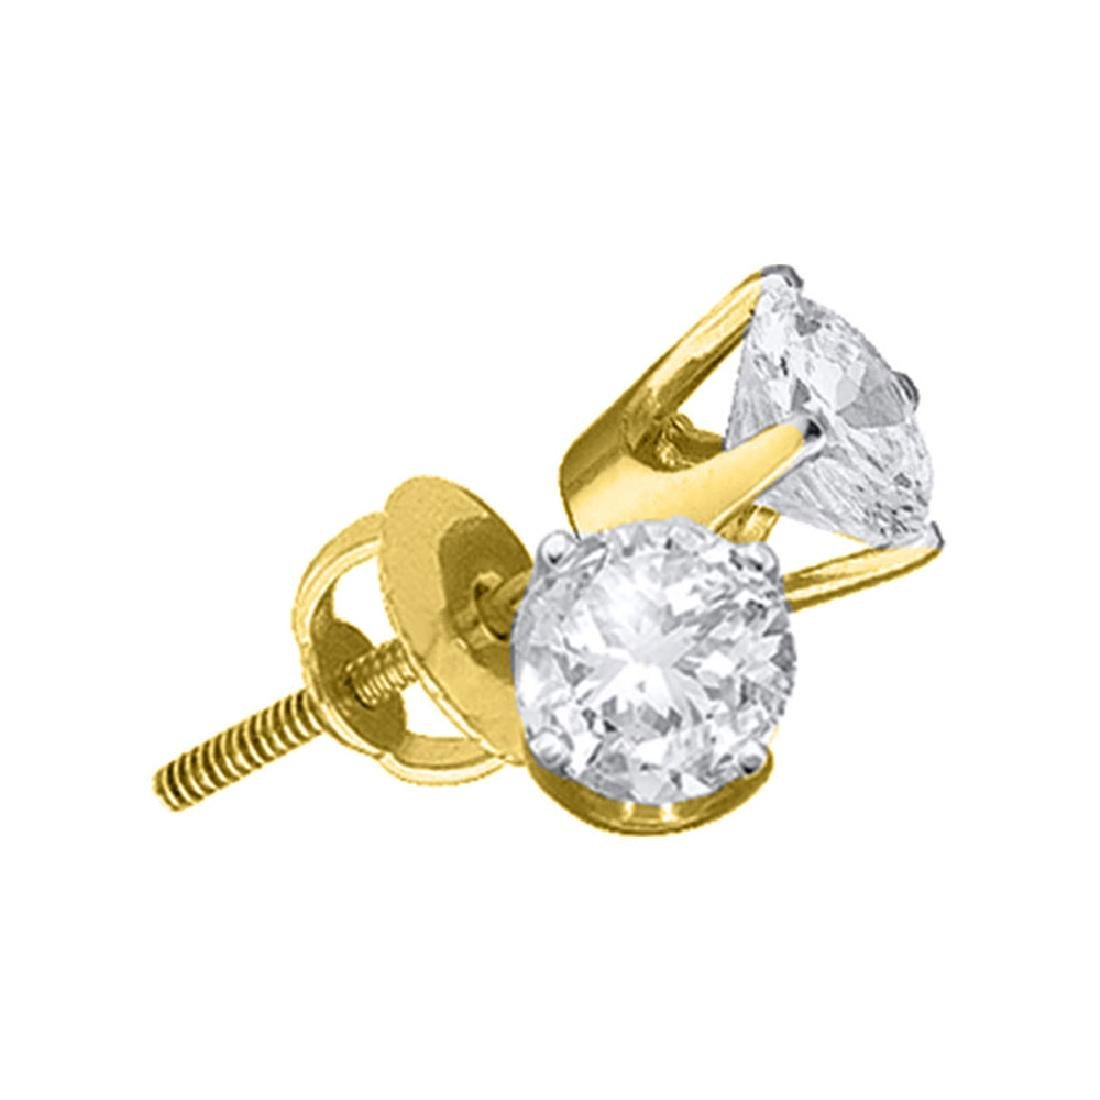 1.03 CTW Diamond Solitaire Stud Earrings 14KT Yellow